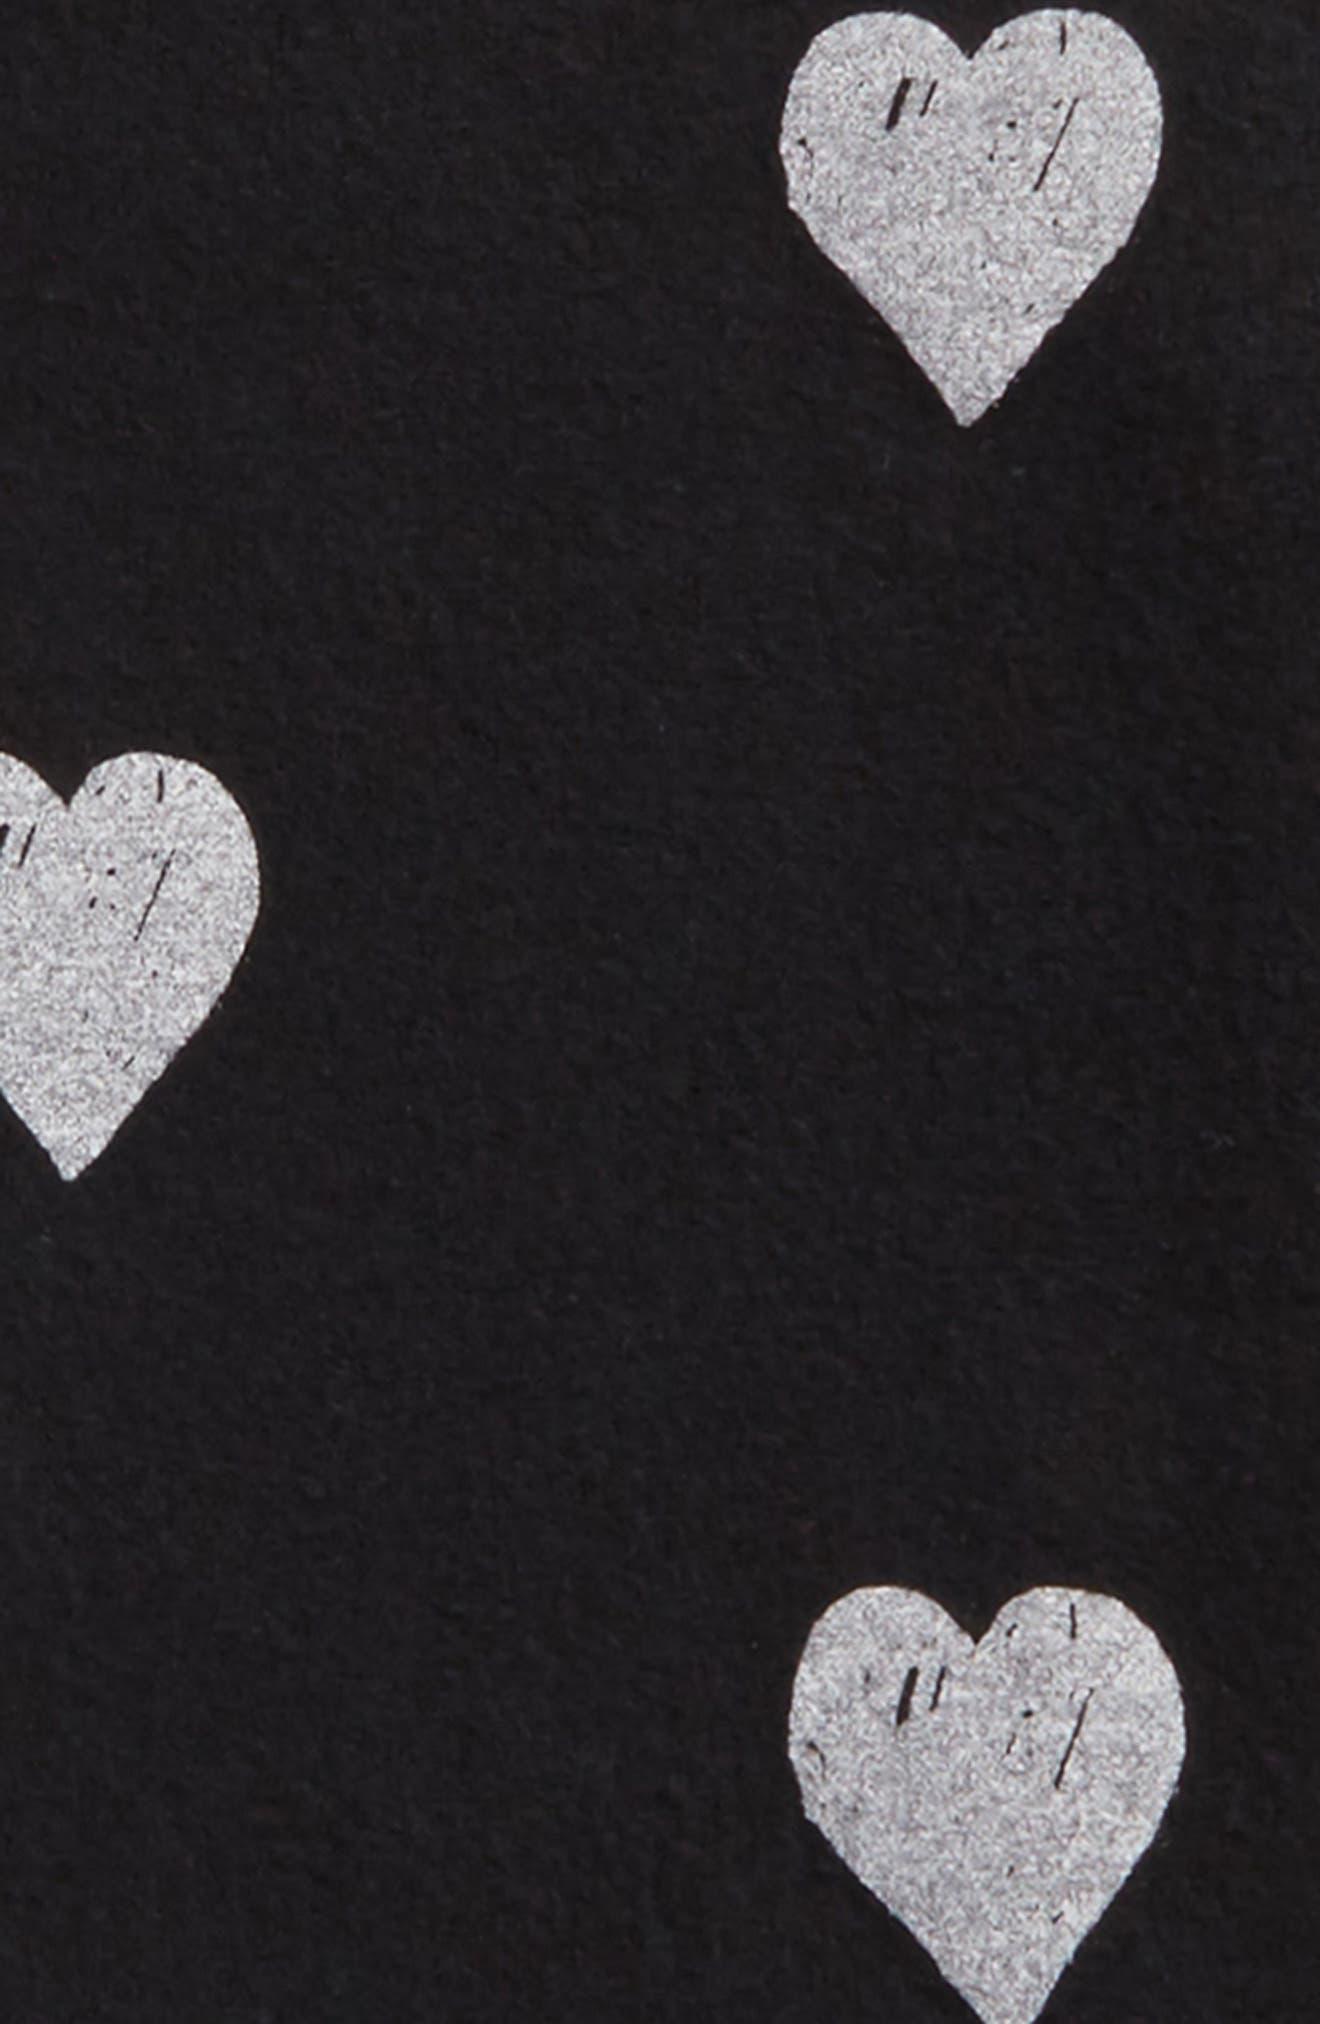 Heart Print Sweatshirt,                             Alternate thumbnail 2, color,                             Black